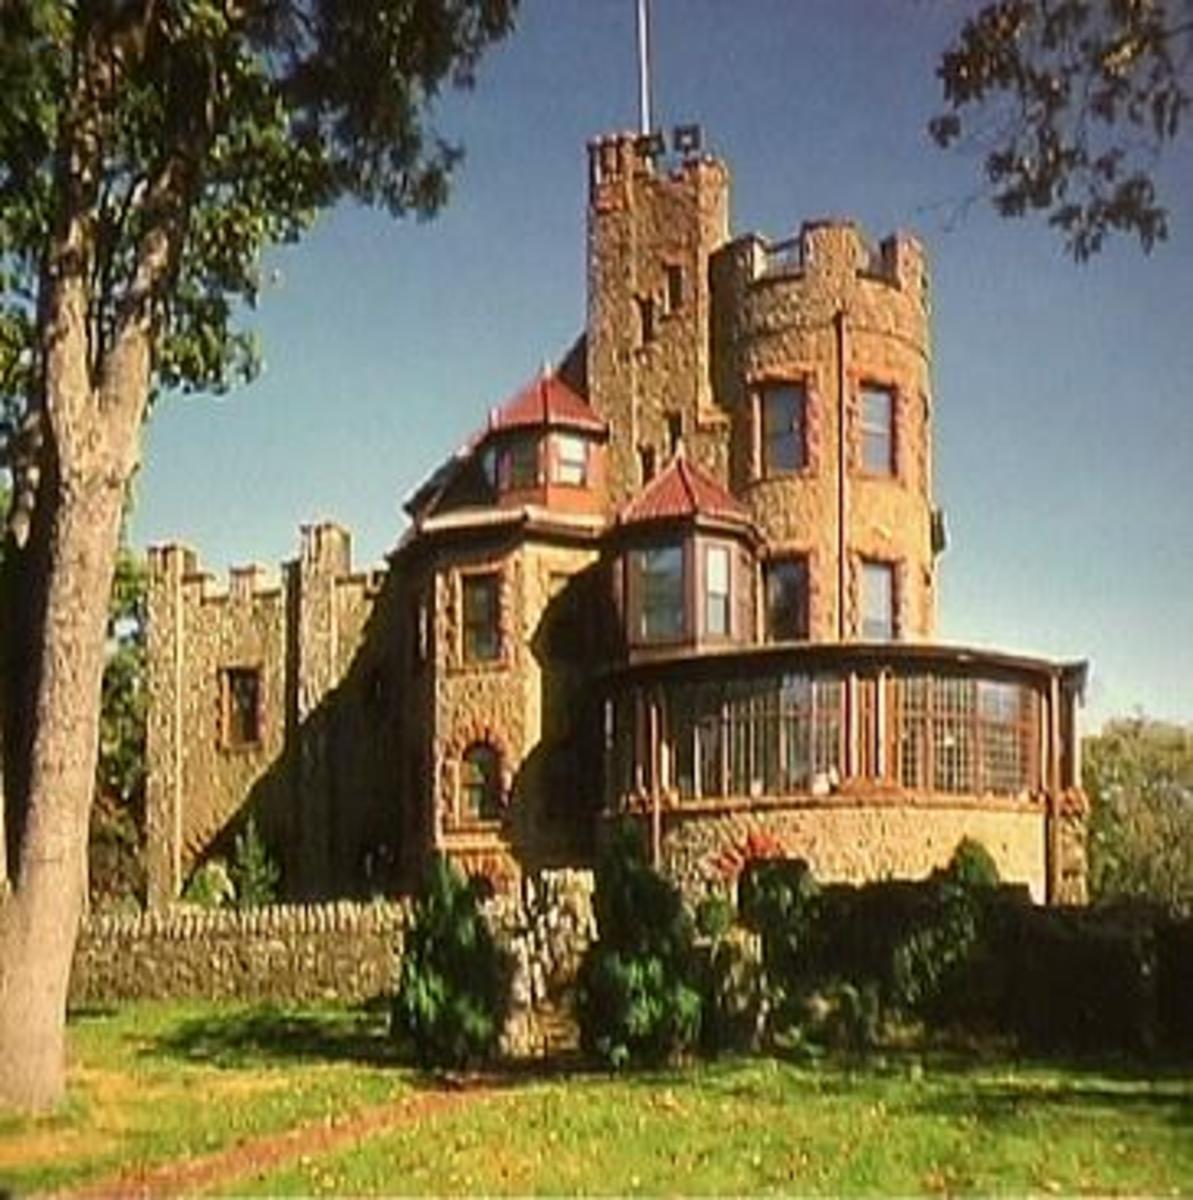 Castles for Sale in America